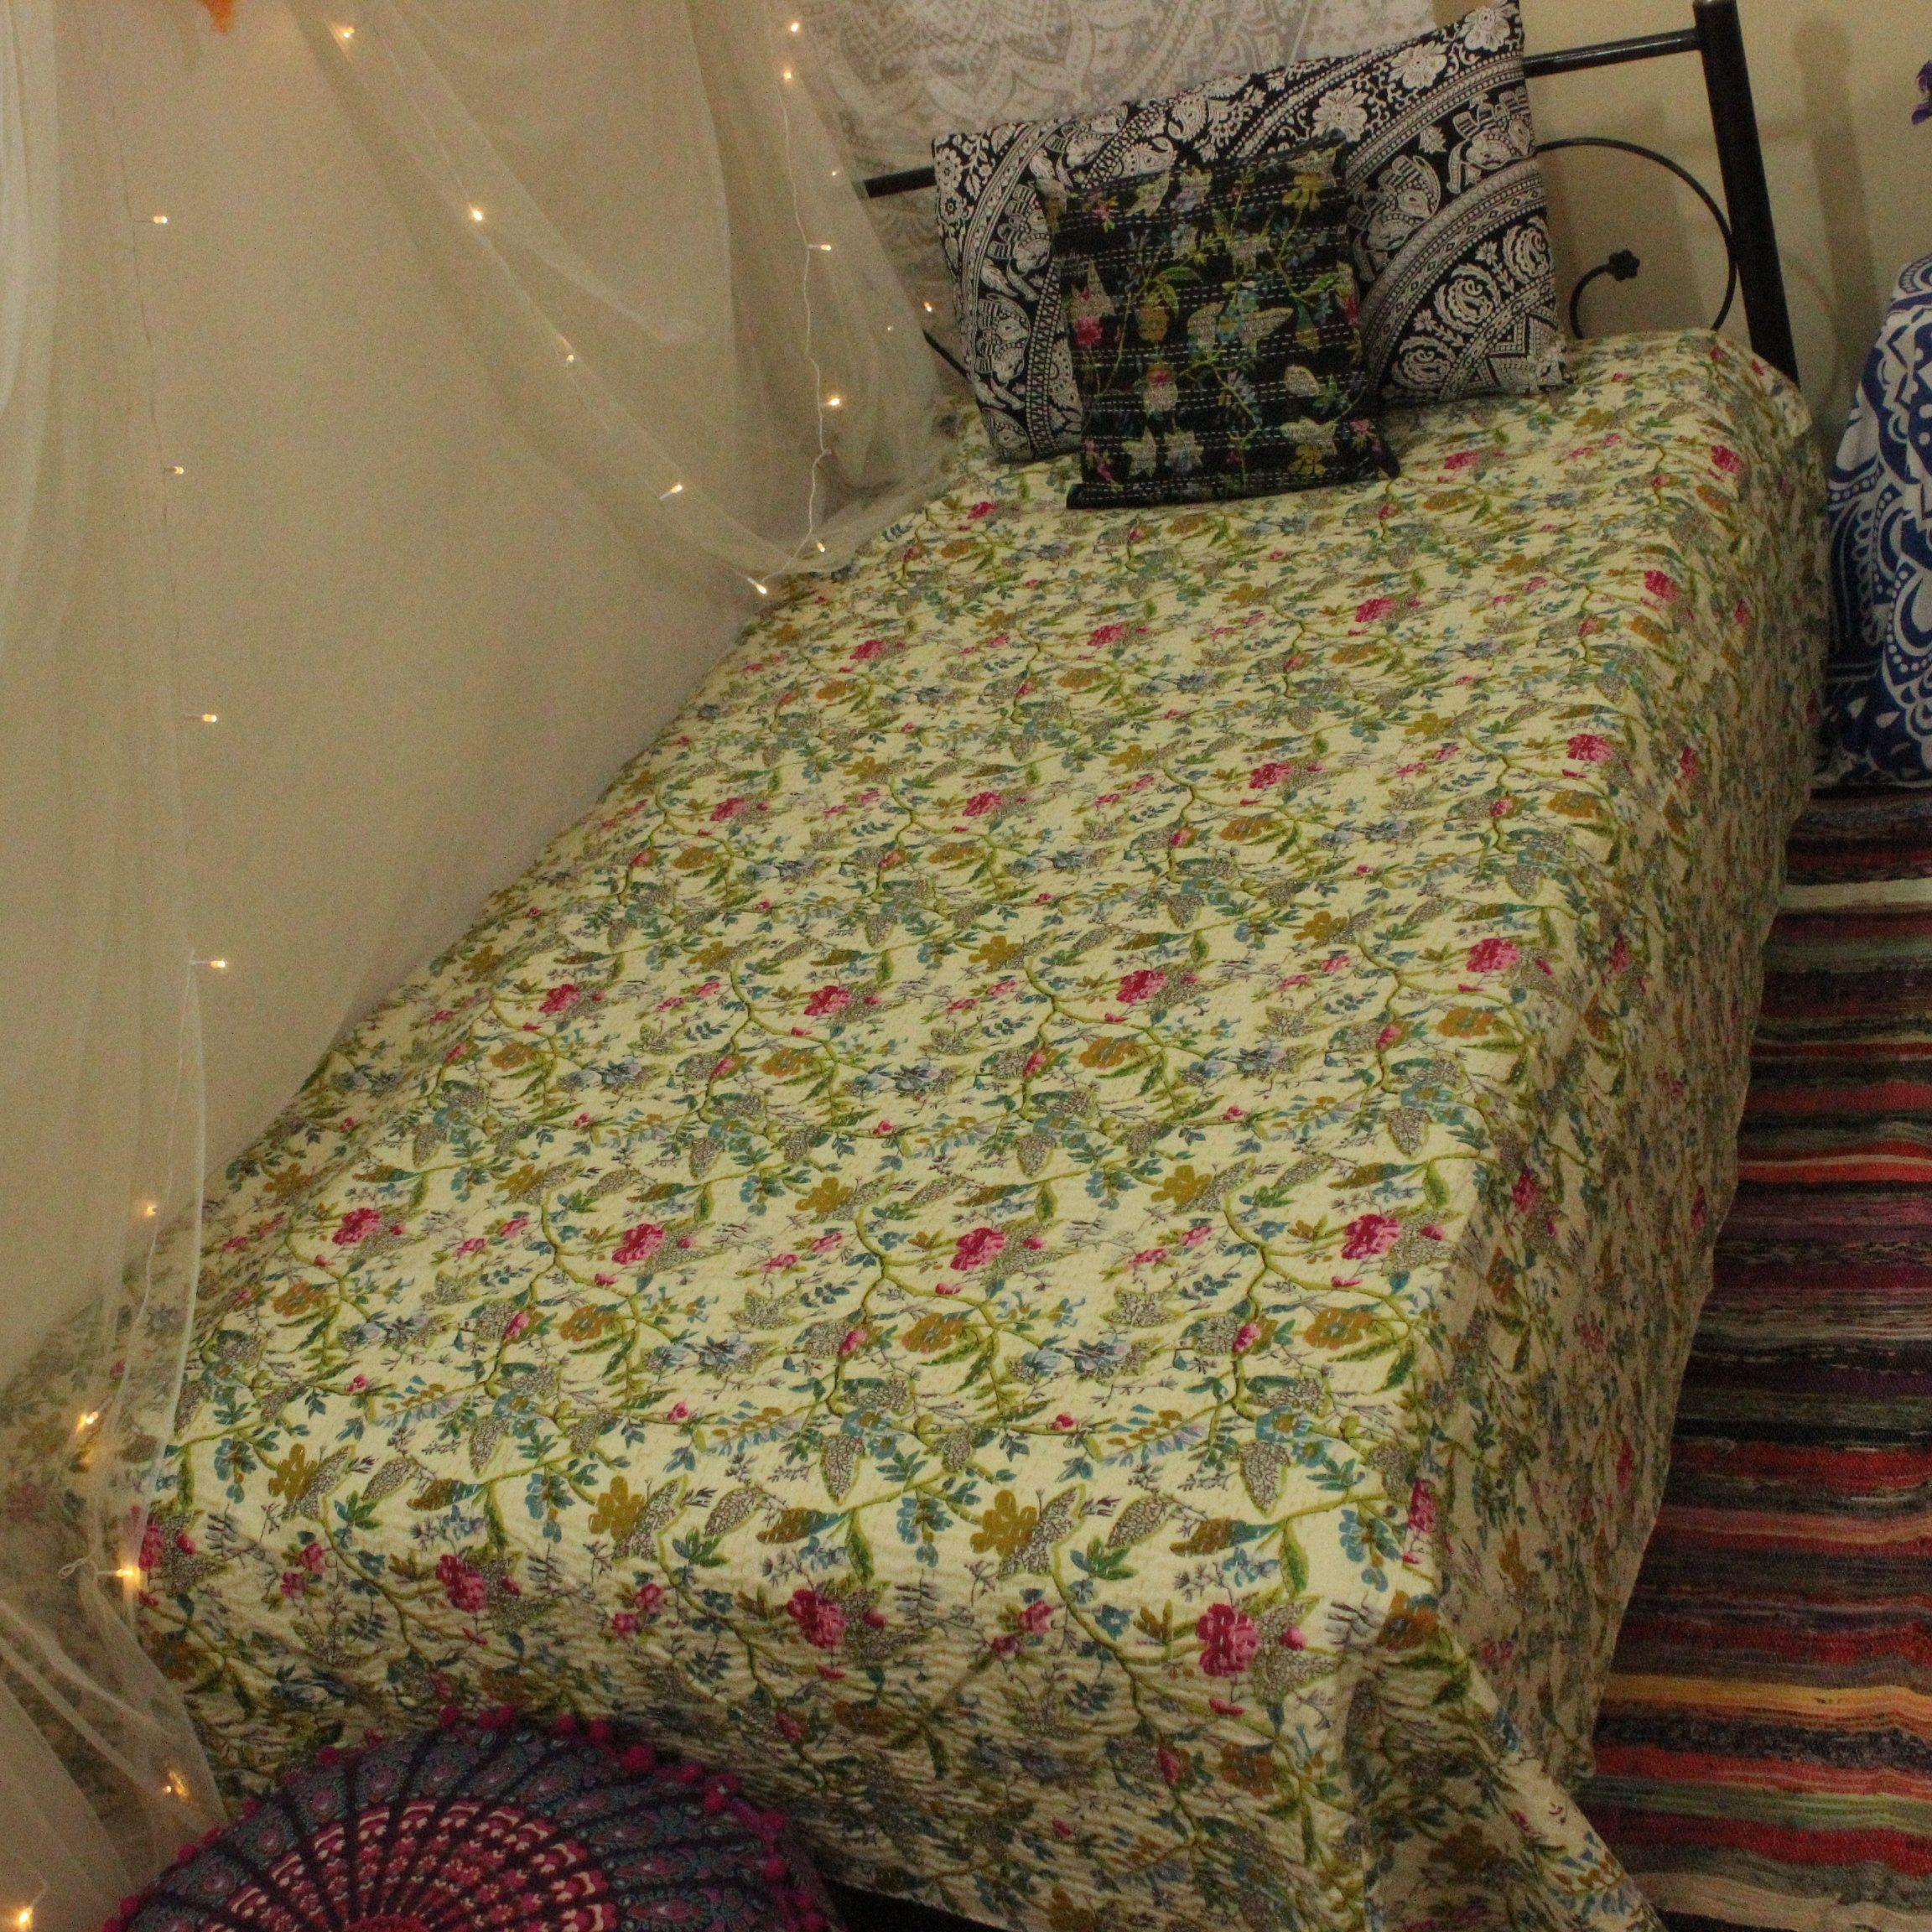 Kantha Bedcover Handmade By KanthaNtapestryart Quilt Kantha Quilt Kantha Bedding Throw Kantha Blanket Bedspread King Size Red Color 88x106